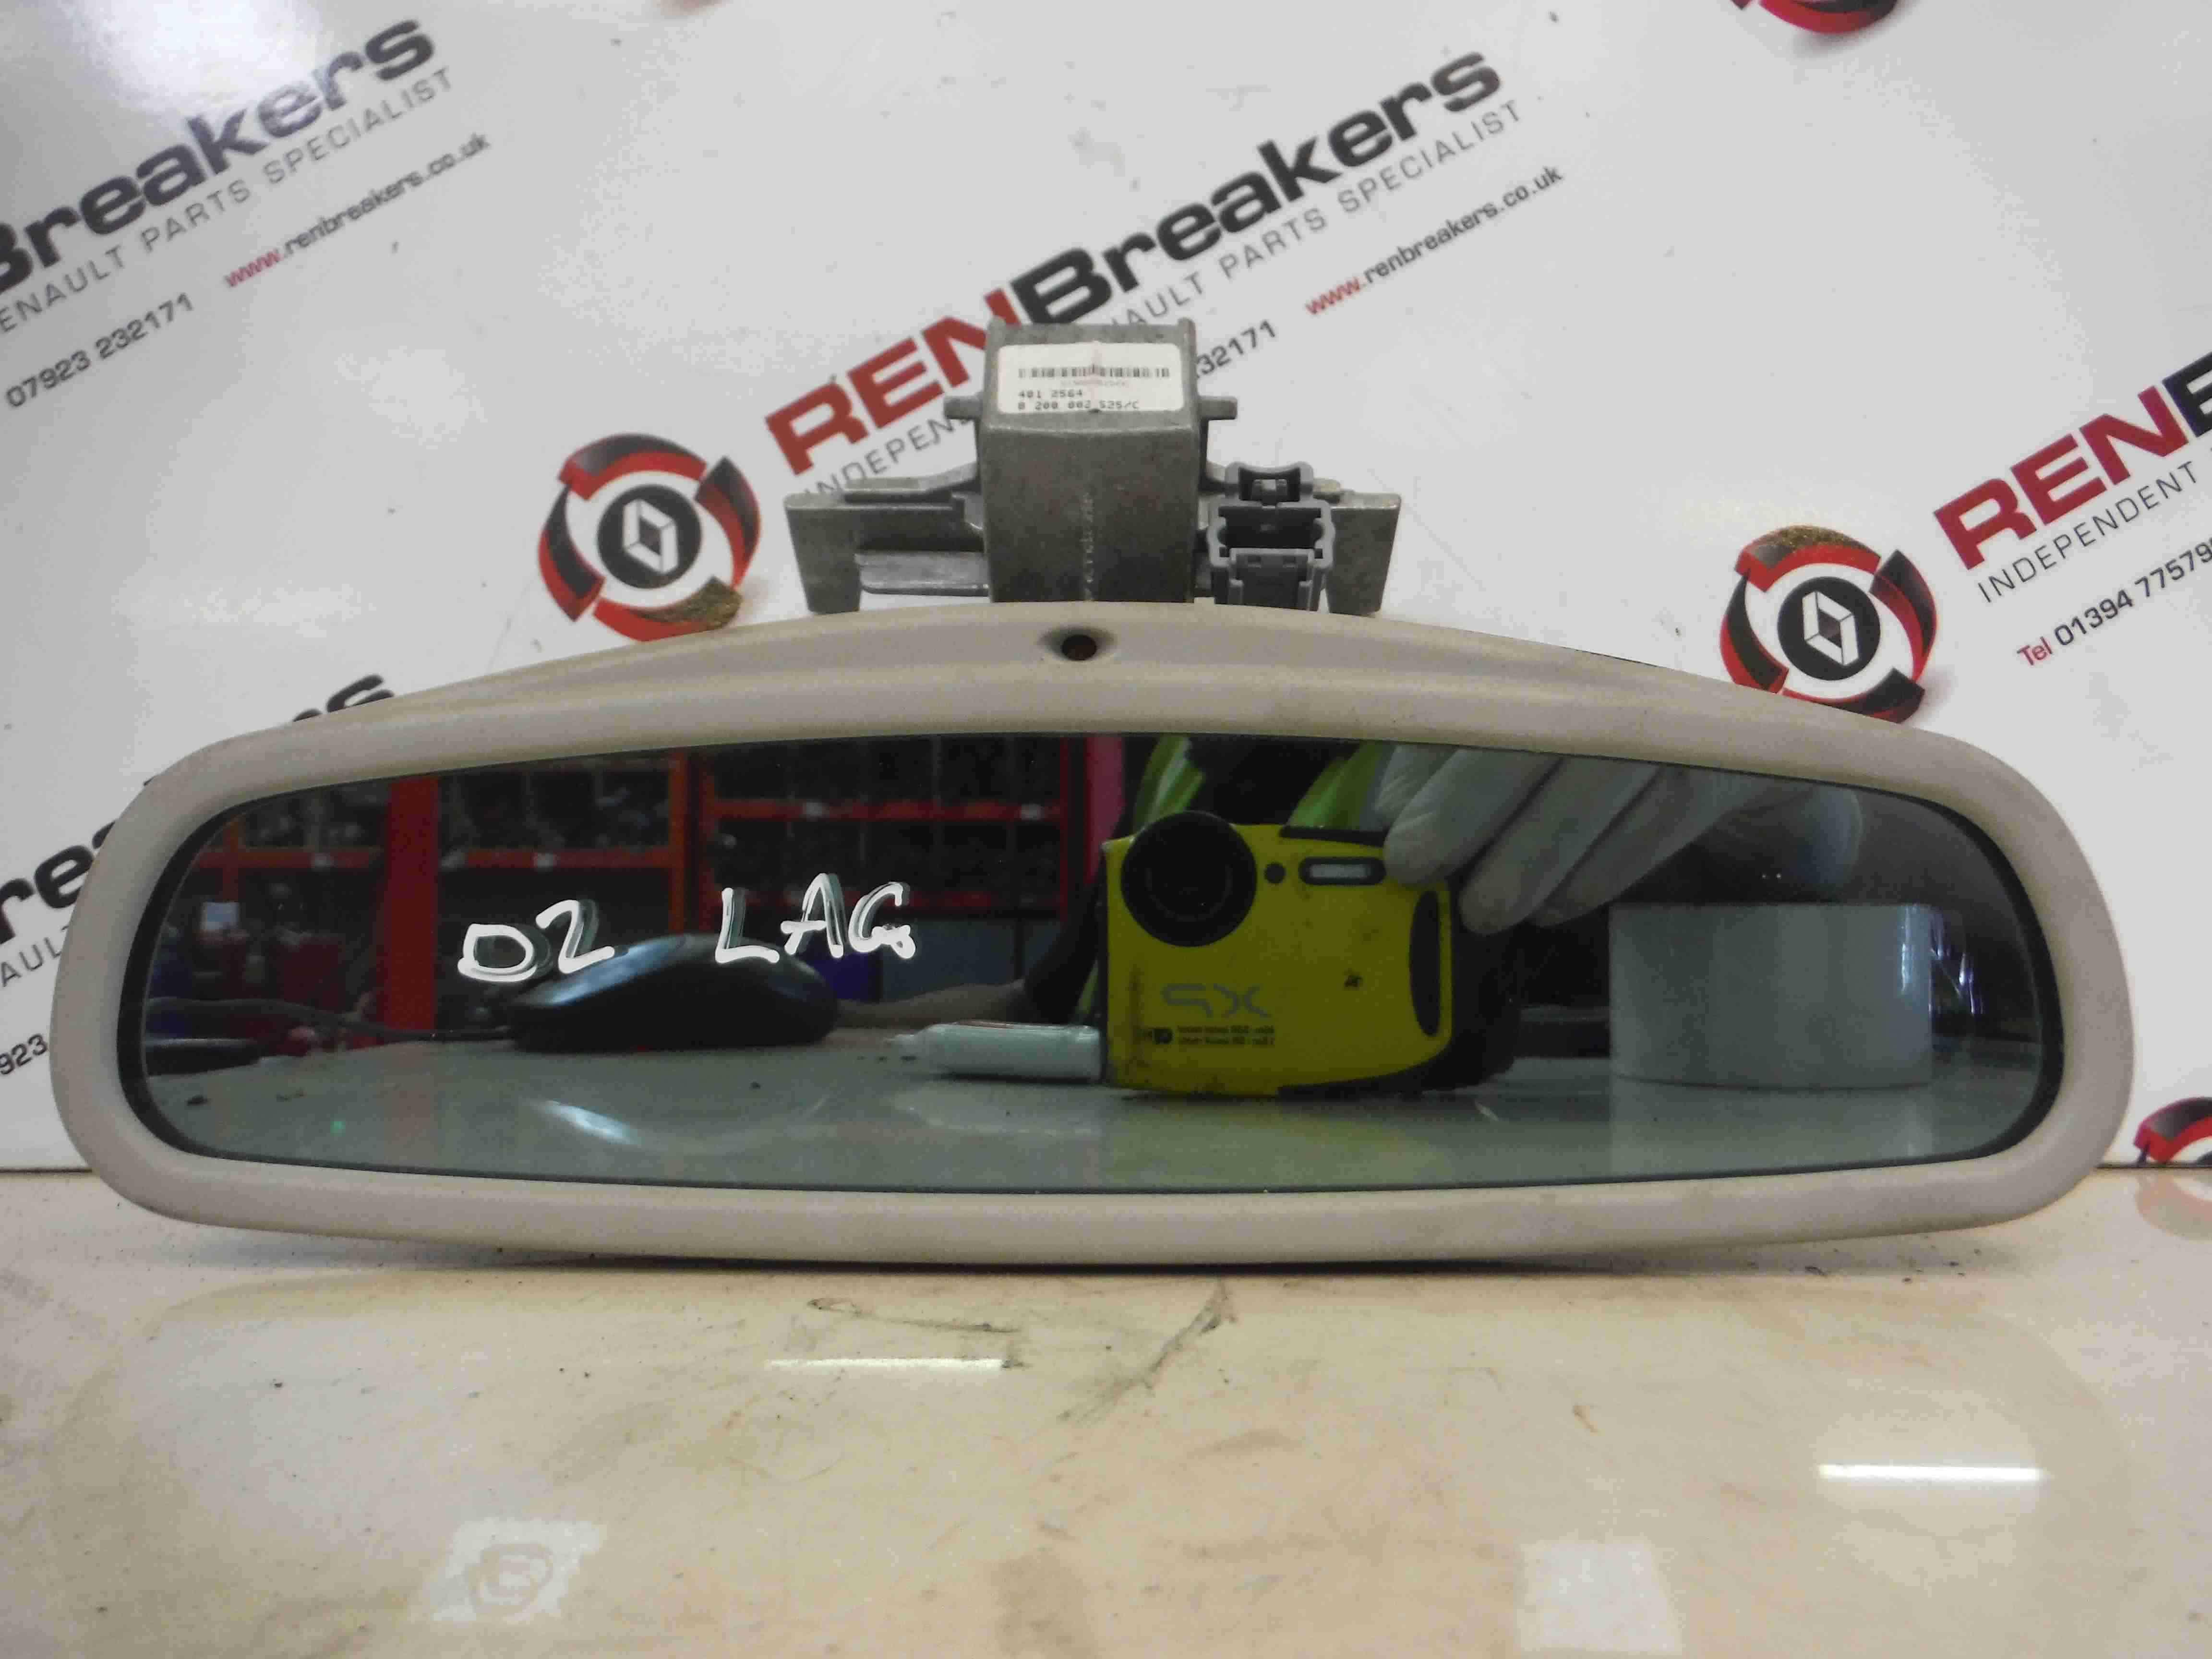 Renault Laguna 2001-2005 Rear View Mirror Autodimming